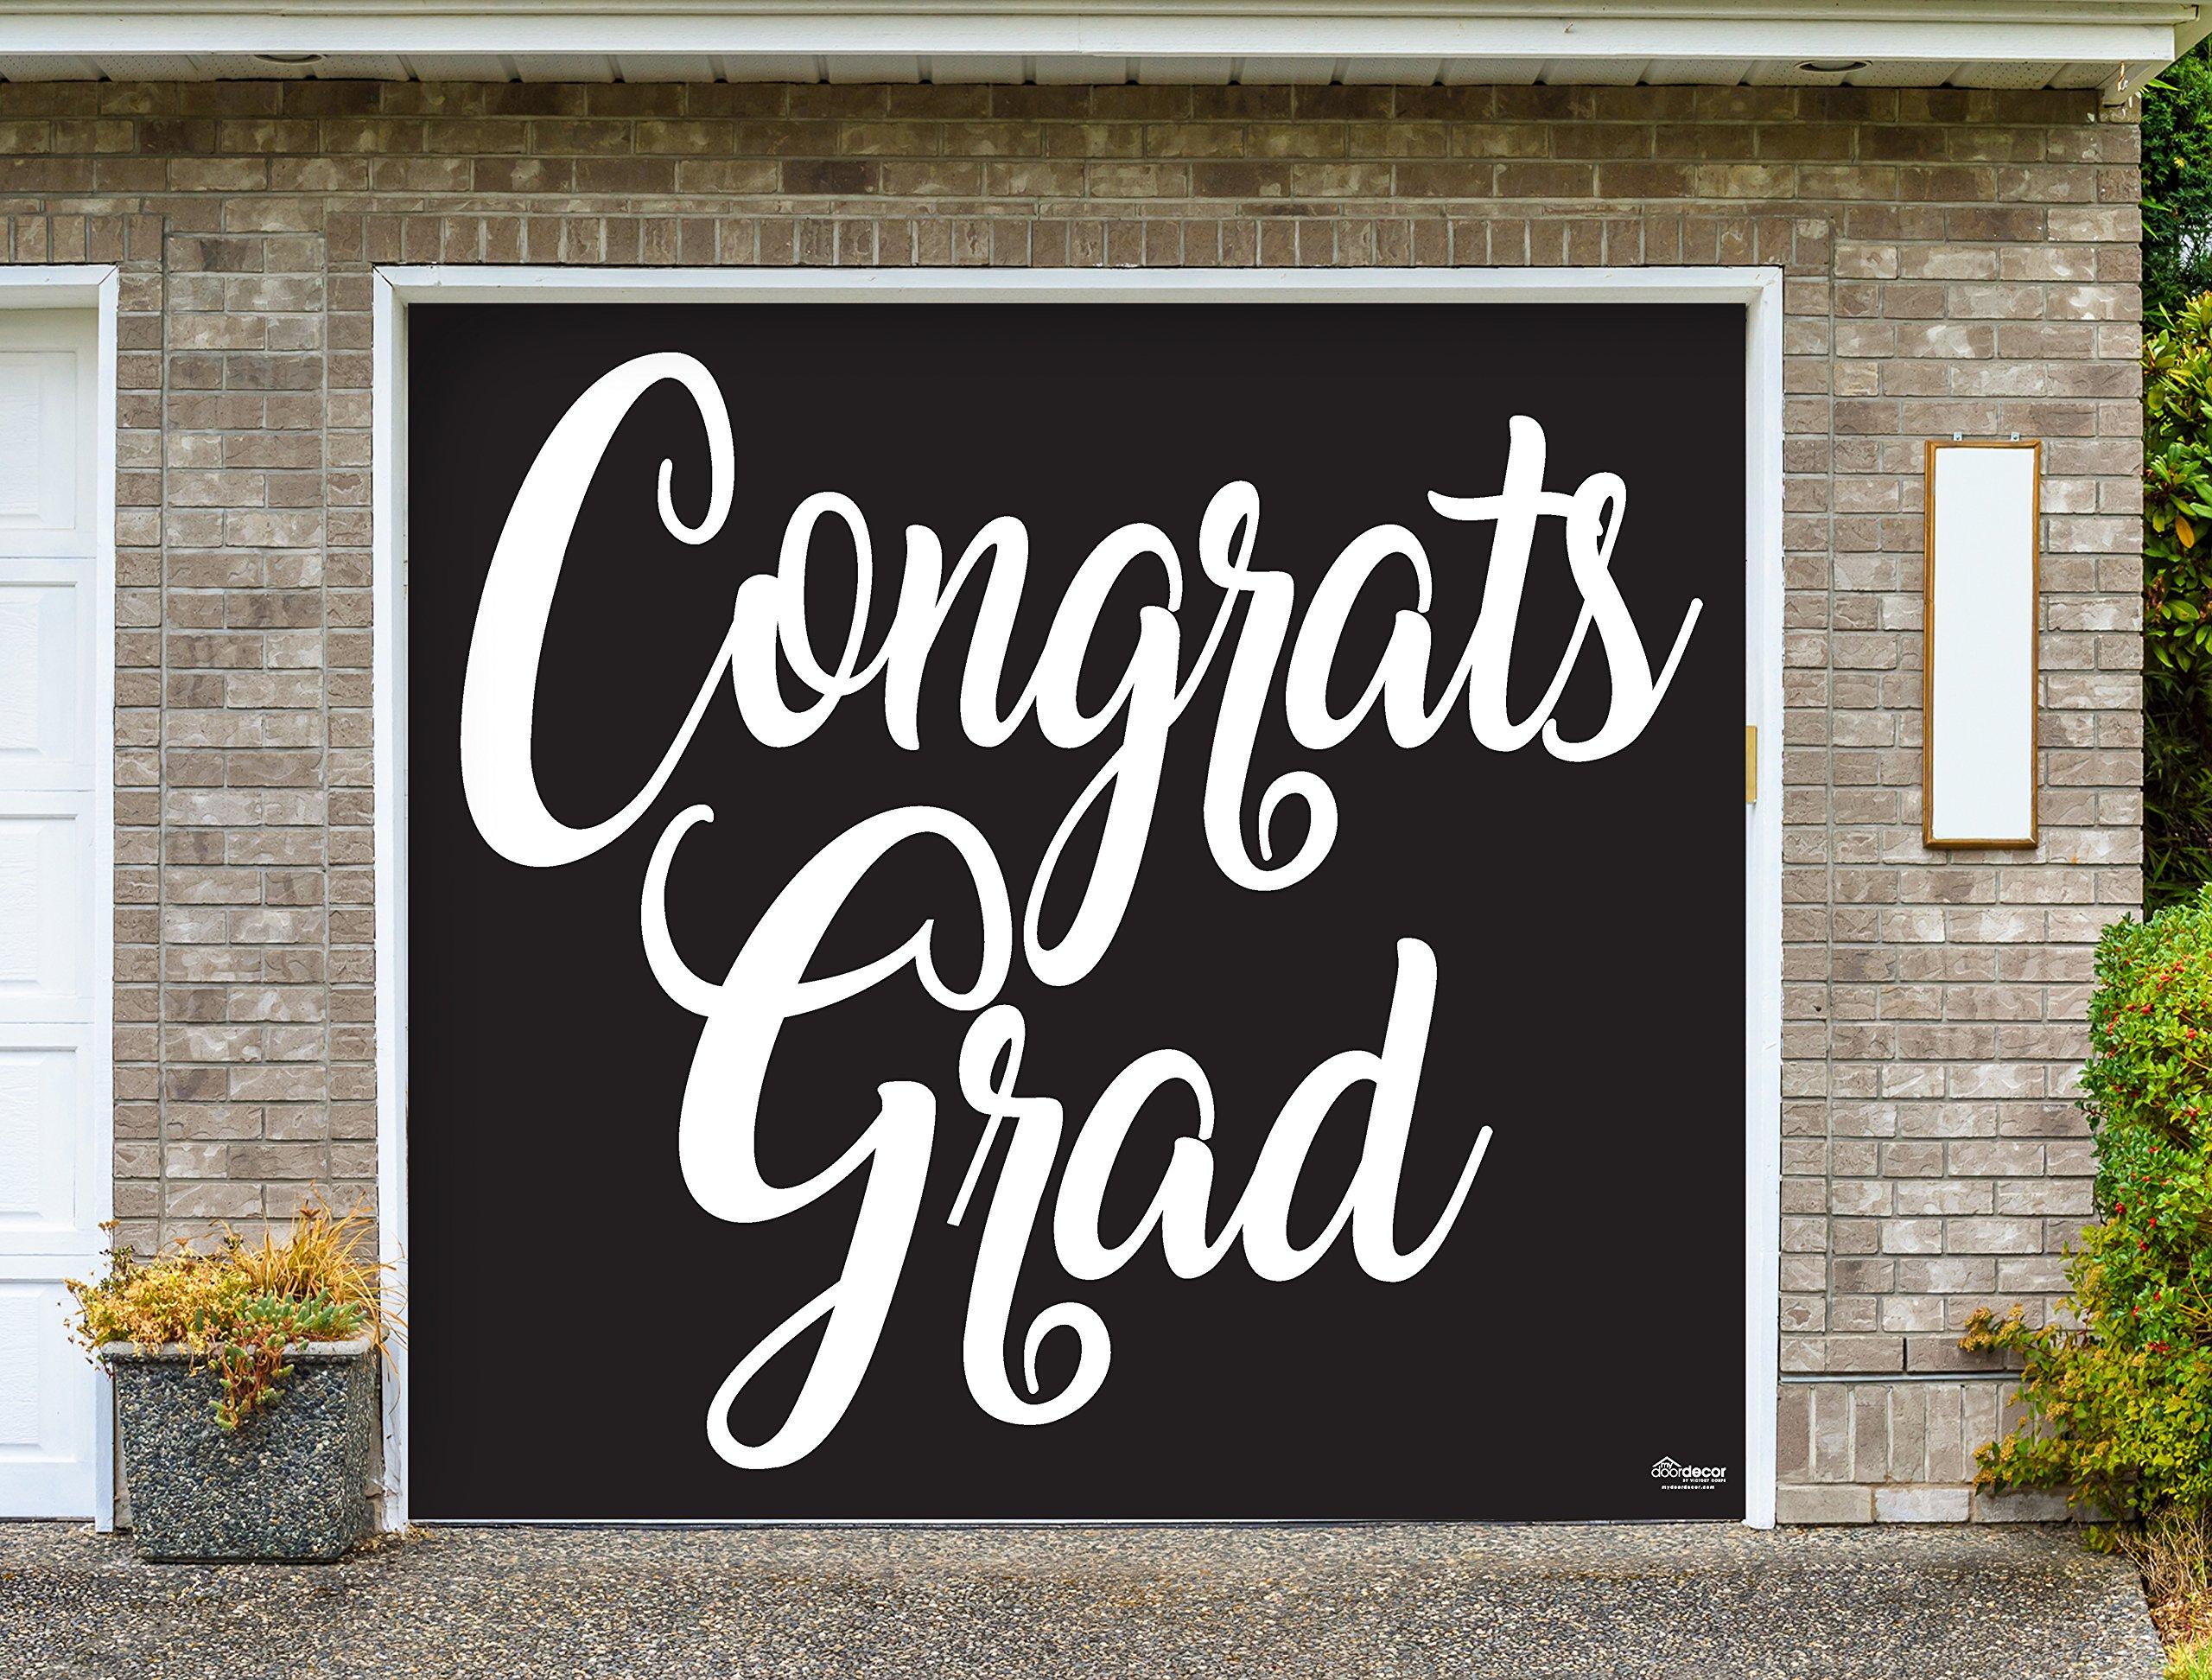 Victory Corps Congrats Grad Black - Outdoor Graduation Garage Door Banner Mural Sign Décor 7'x 8' Car Garage - The Original Holiday Garage Door Banner Decor